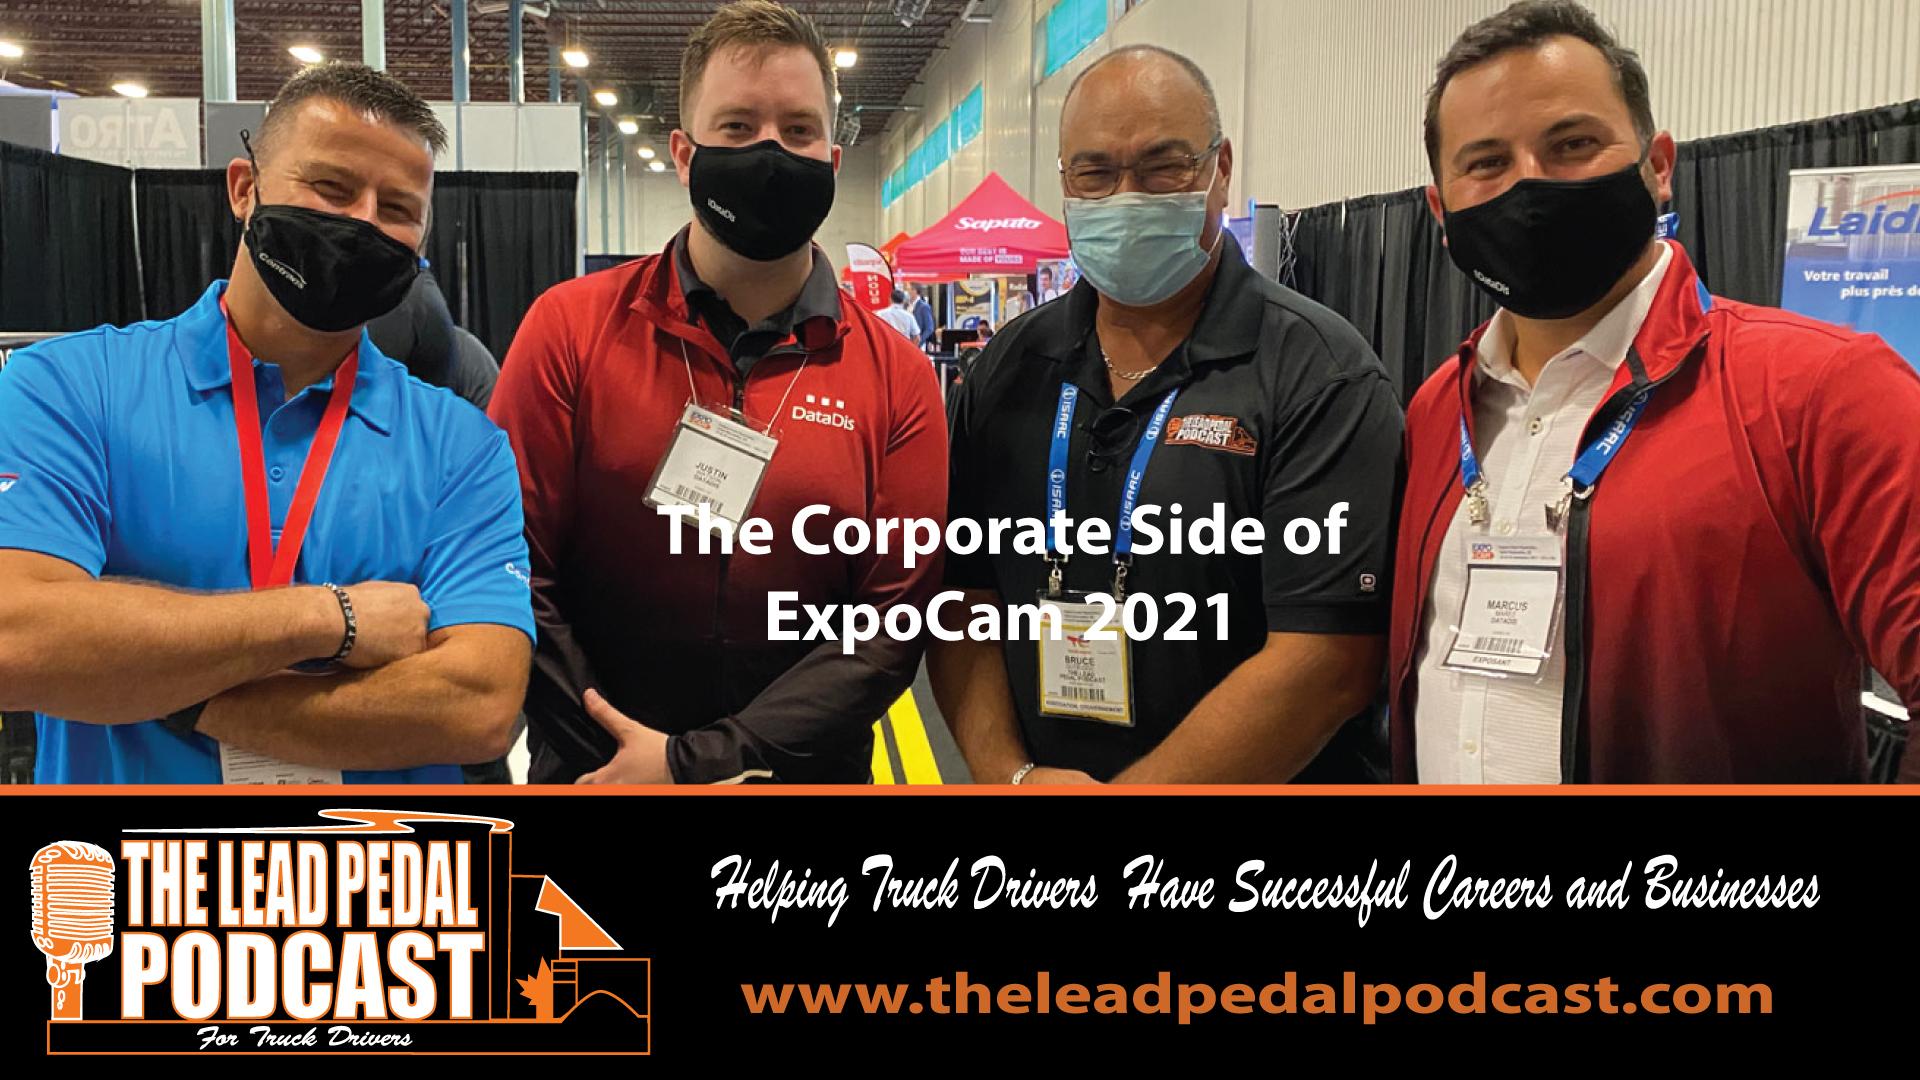 LP699 Recap Expocam Part Two - The Corporate Side